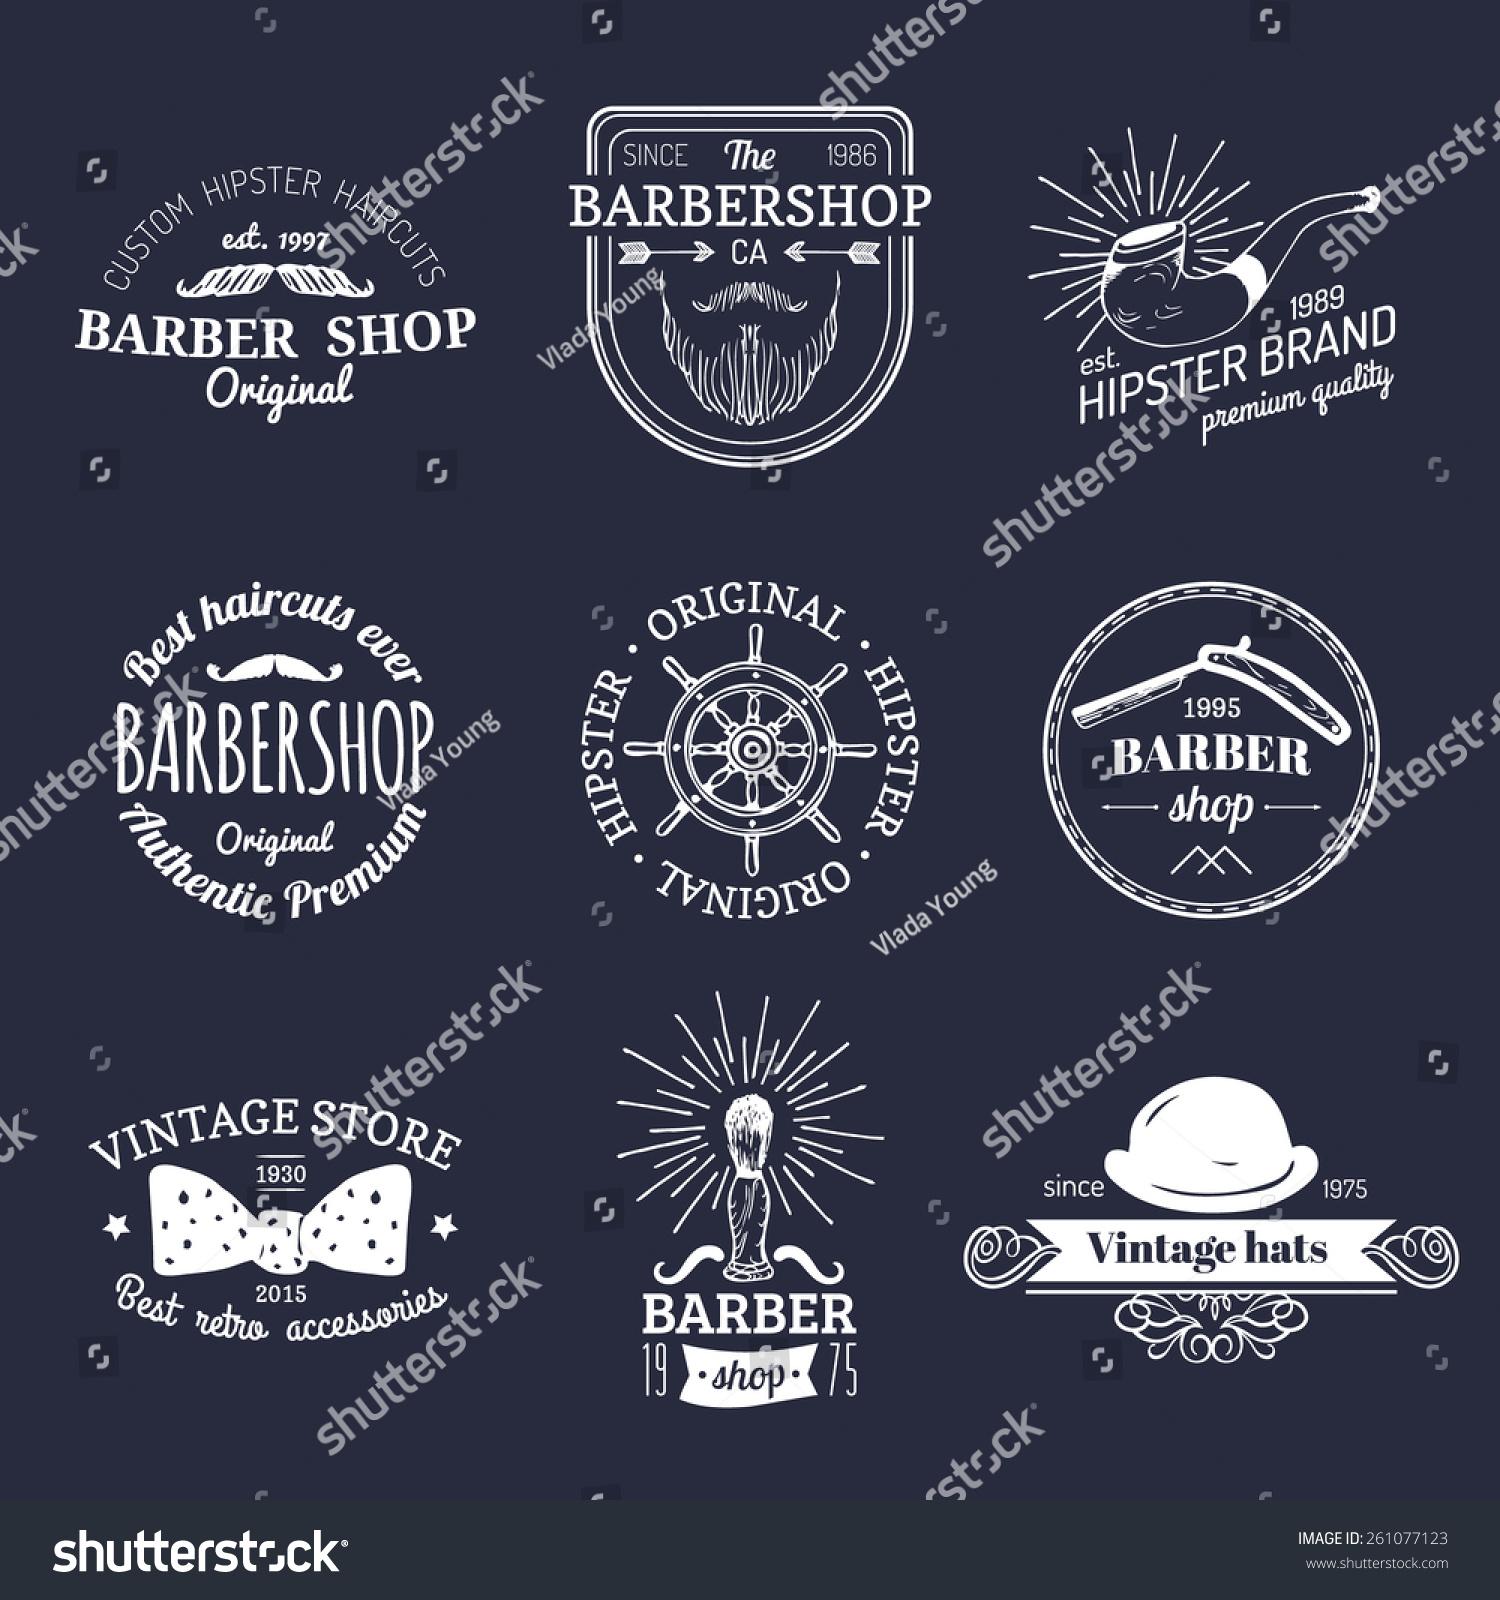 Clip art vector of vintage barber shop logo graphics and icon vector - Vector Set Of Vintage Hipster Logos Retro Icons Collection Of Vintage Barber Shop Equipments